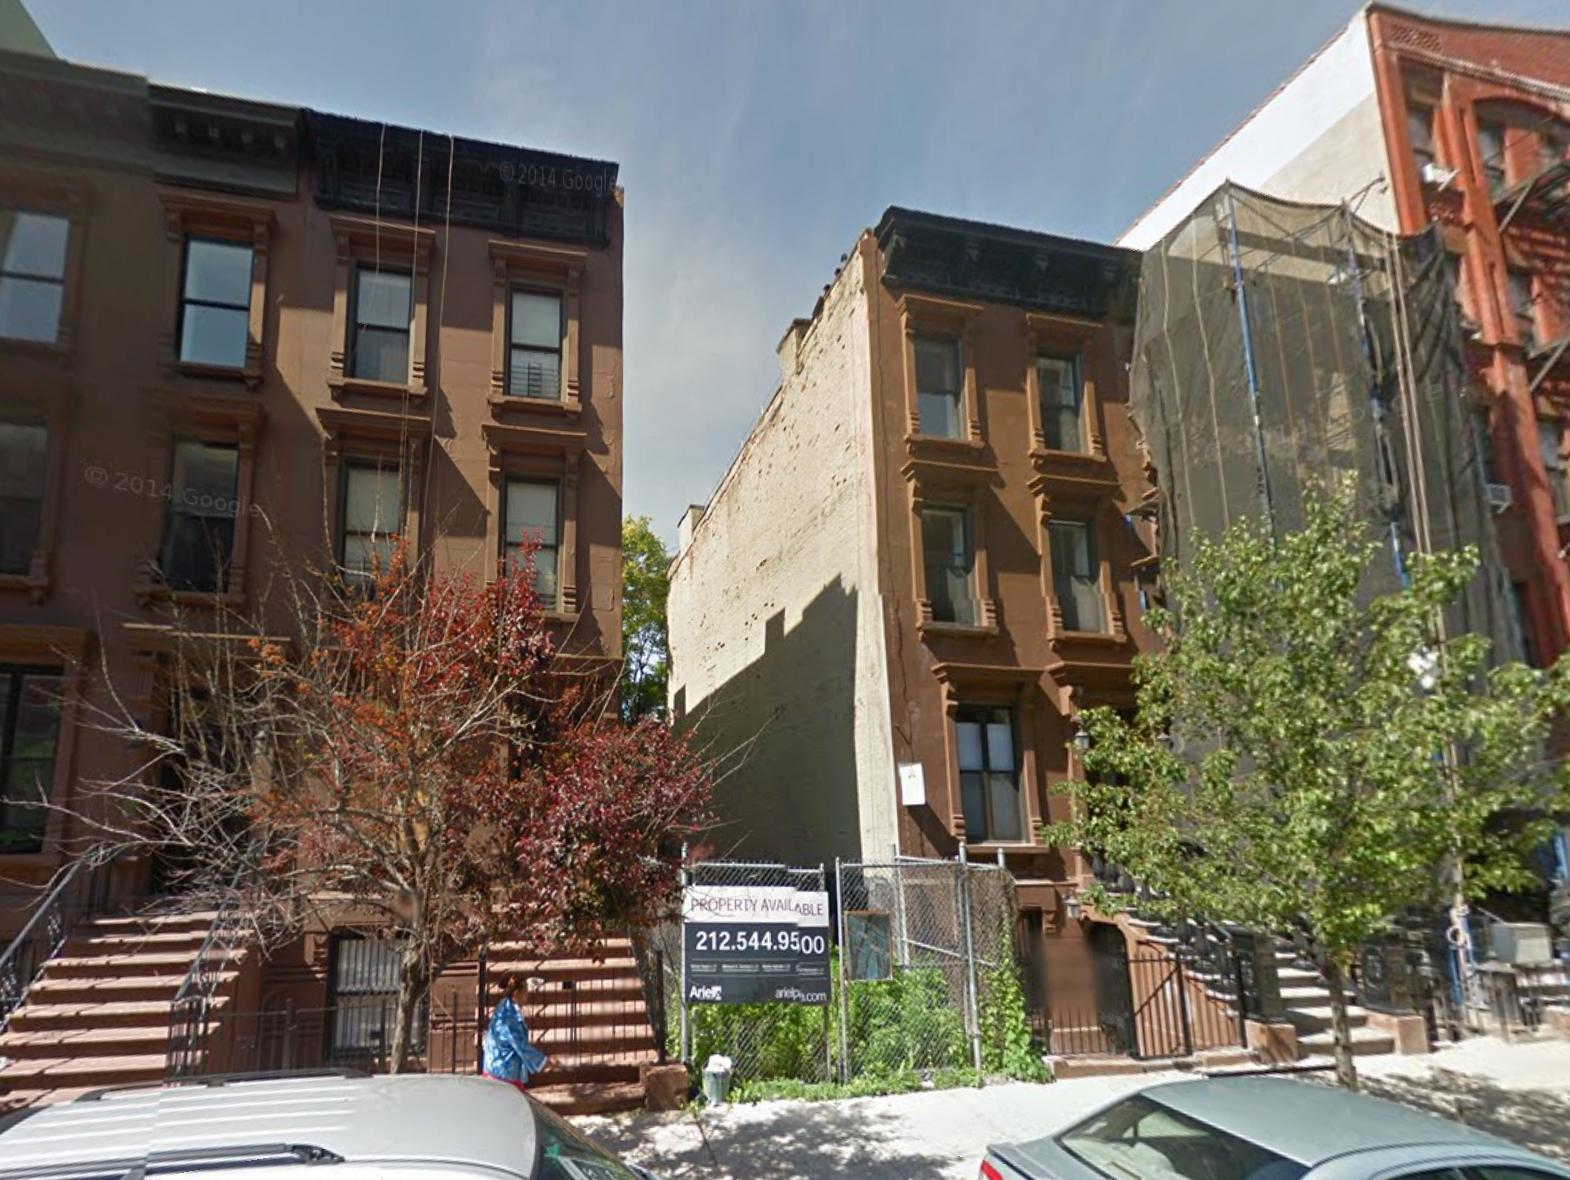 116 West 127th Street